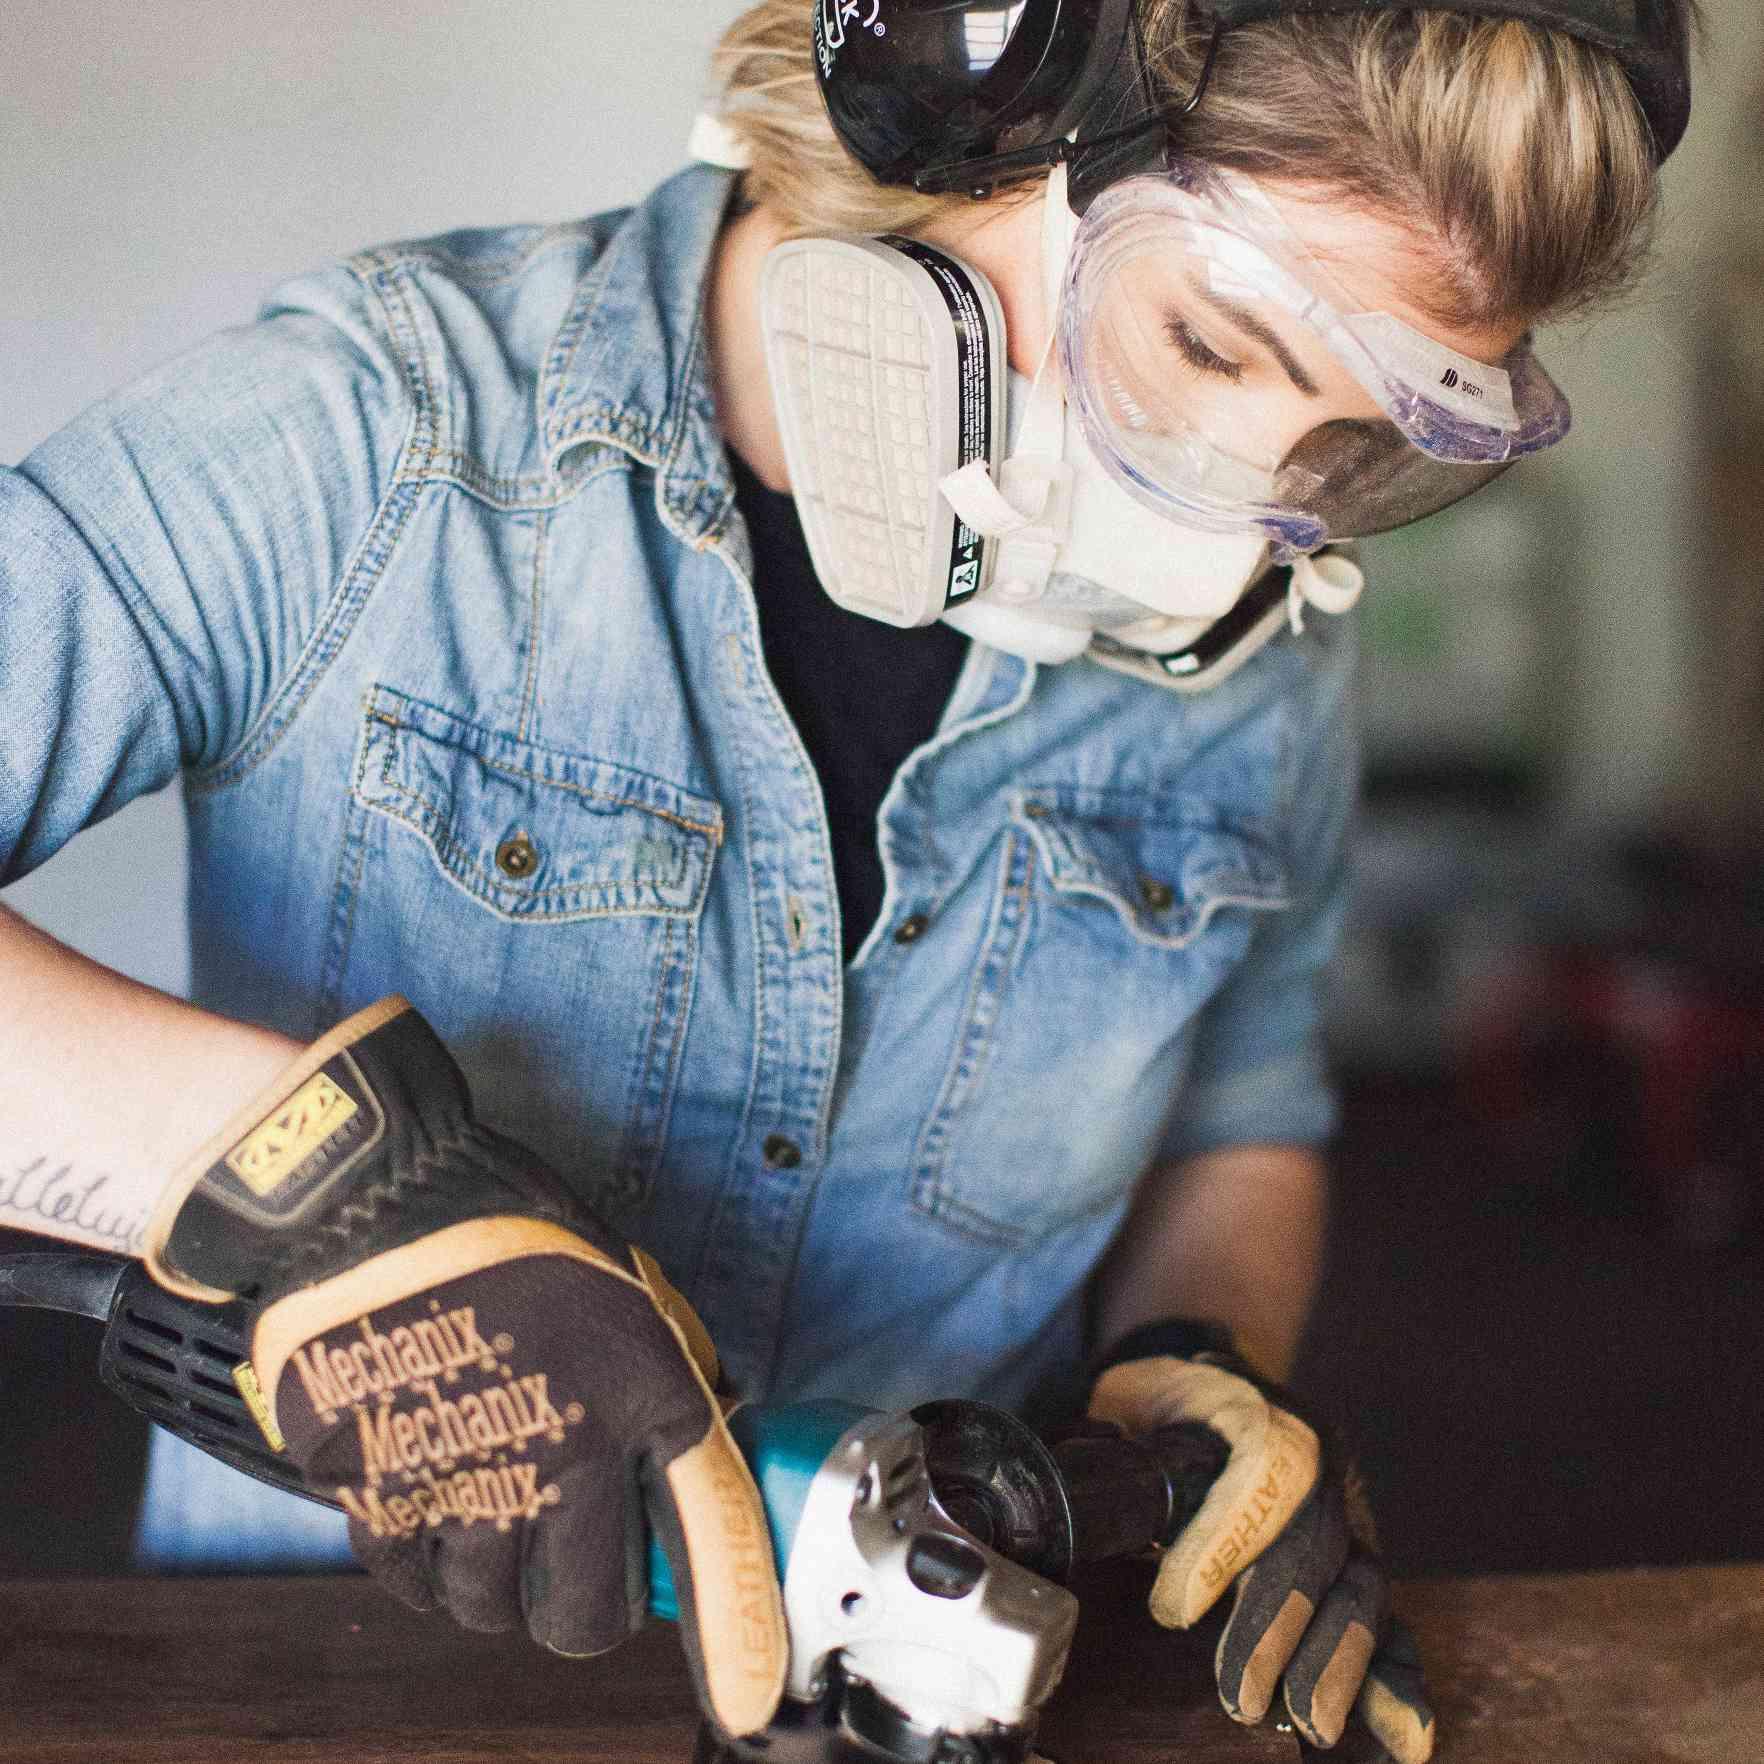 Karissa cross working with wood